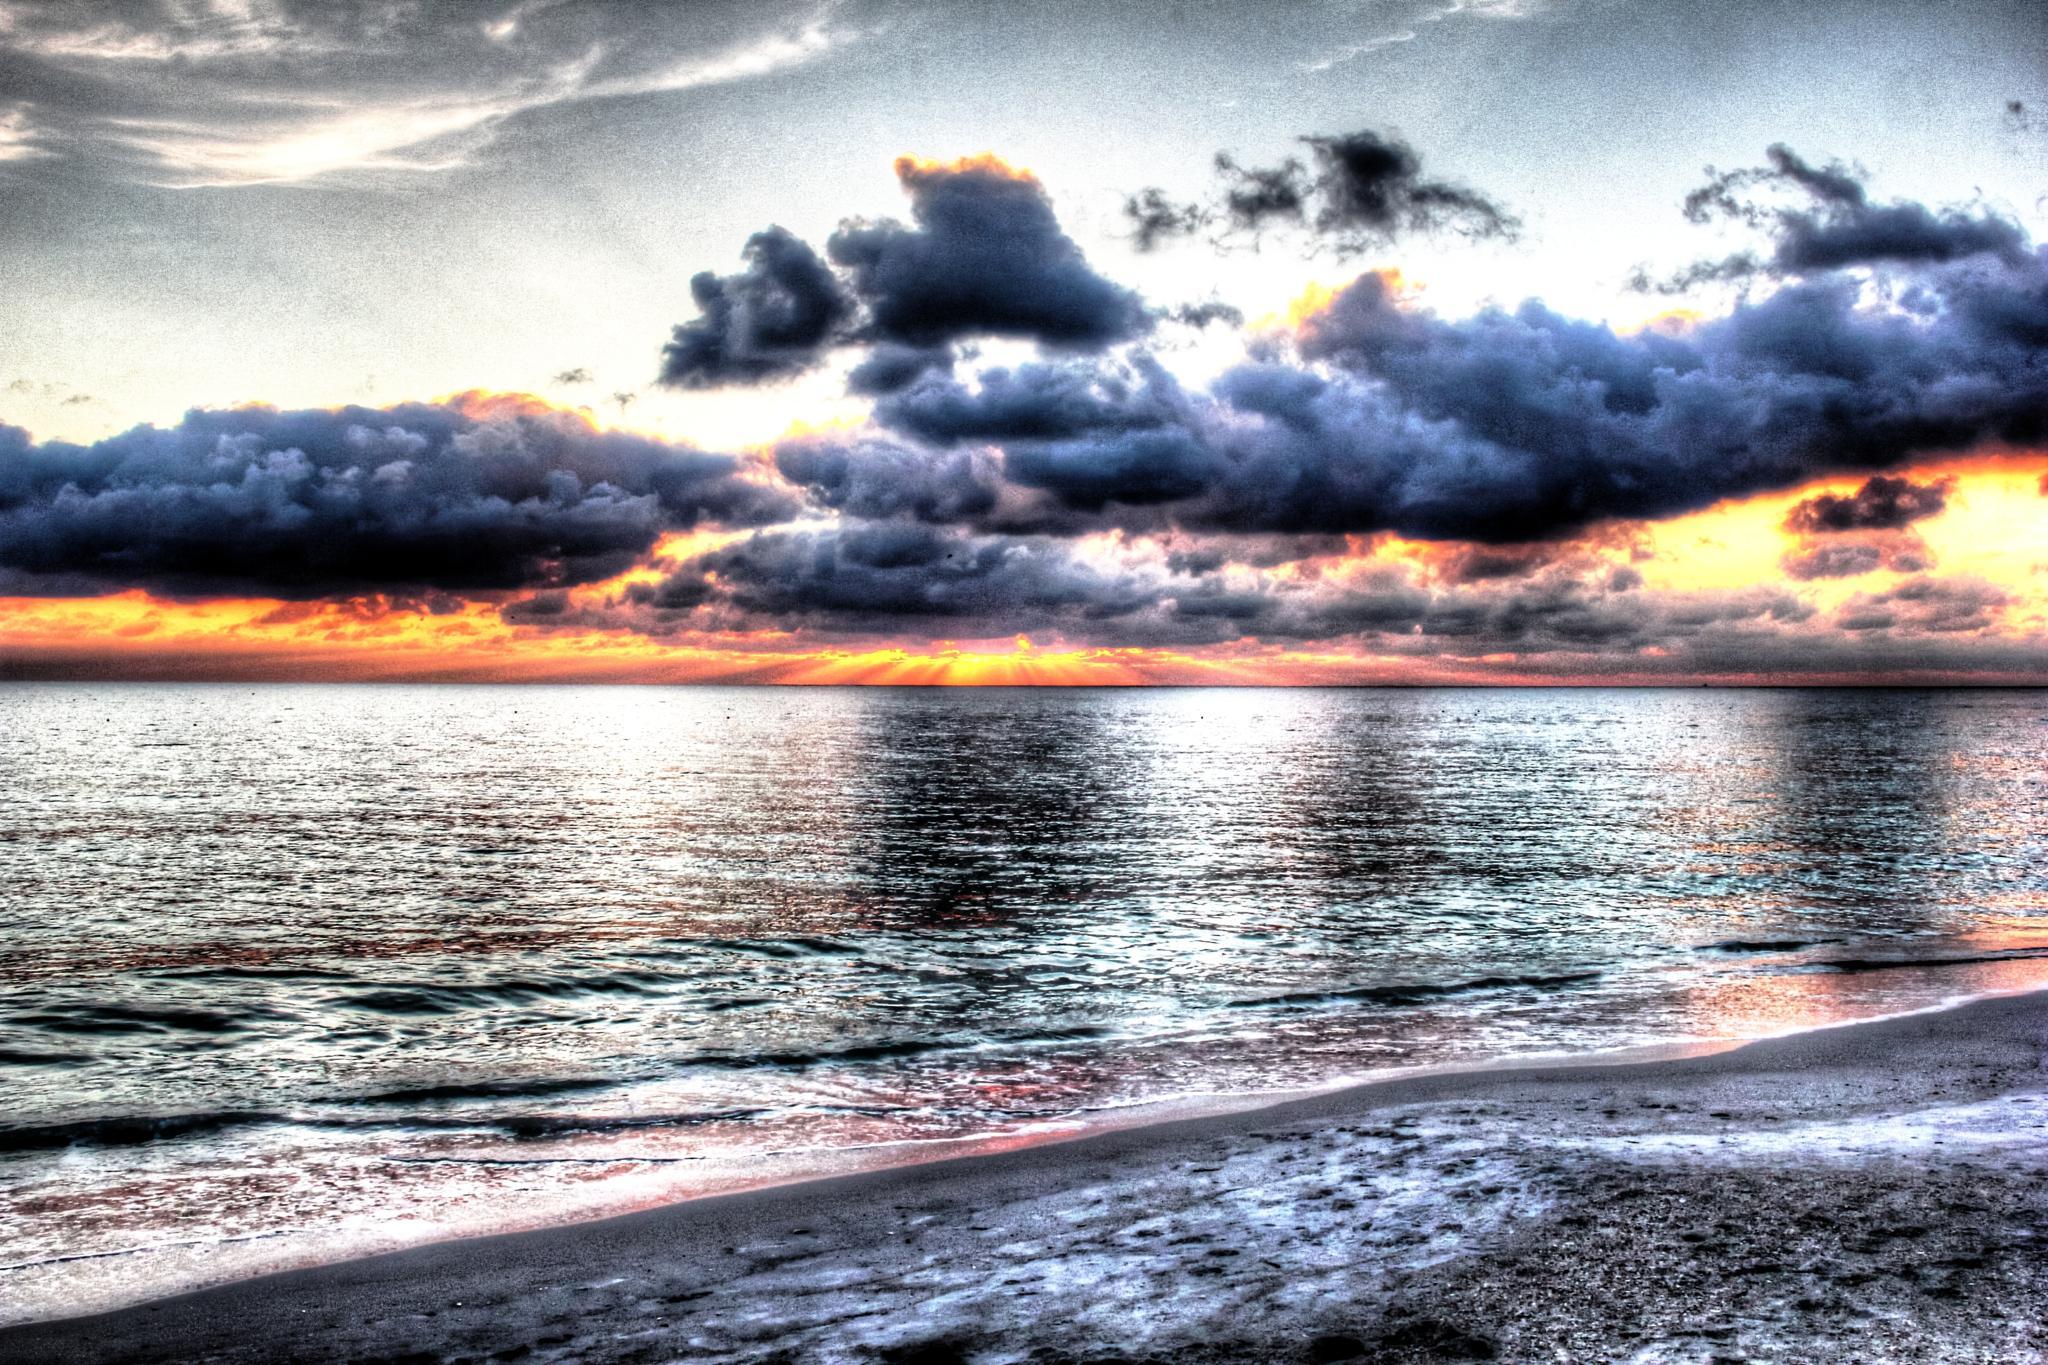 At the Beach by Tcko